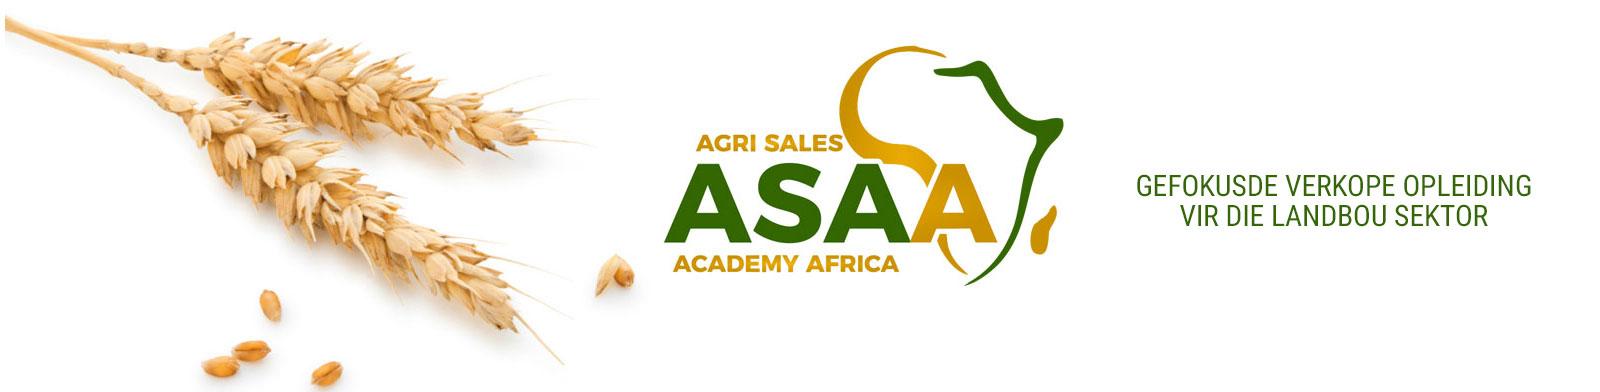 Agri Sales Academy Africa